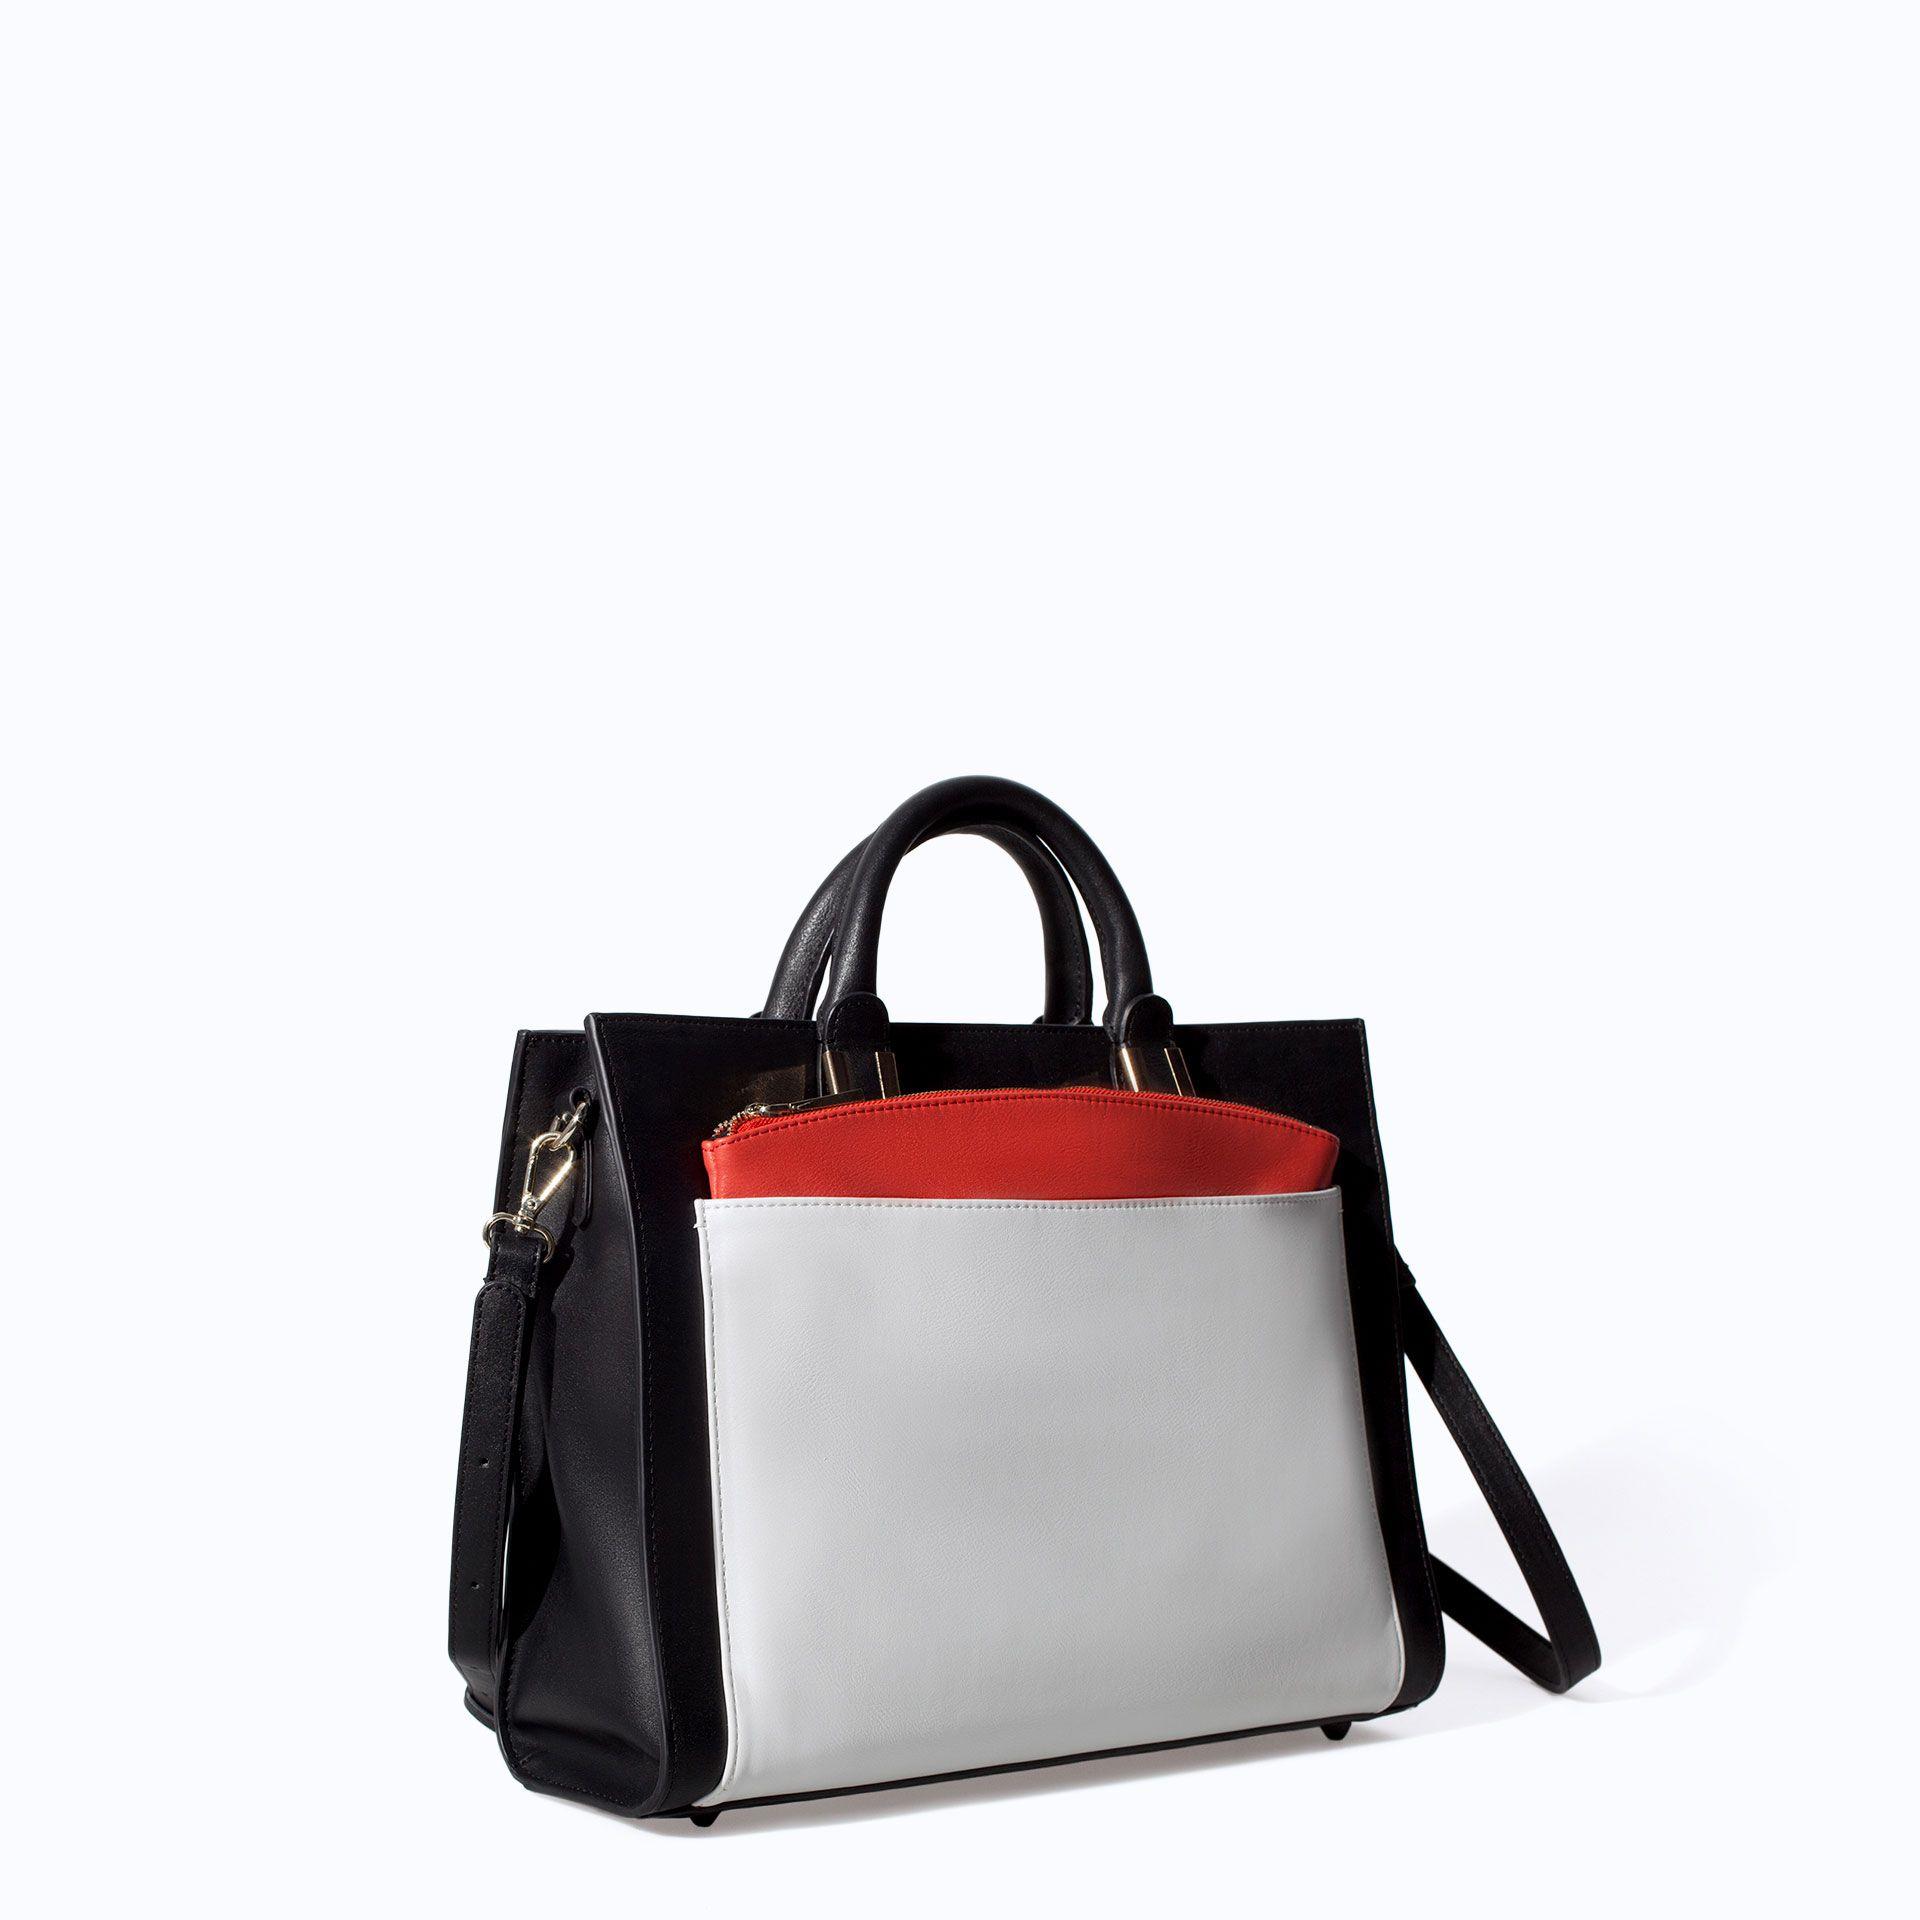 Zara woman combined office Innovative Zara Woman Combined Office Citybag Pinterest Zara Woman Combined Office Citybag Wardrobe Glamour